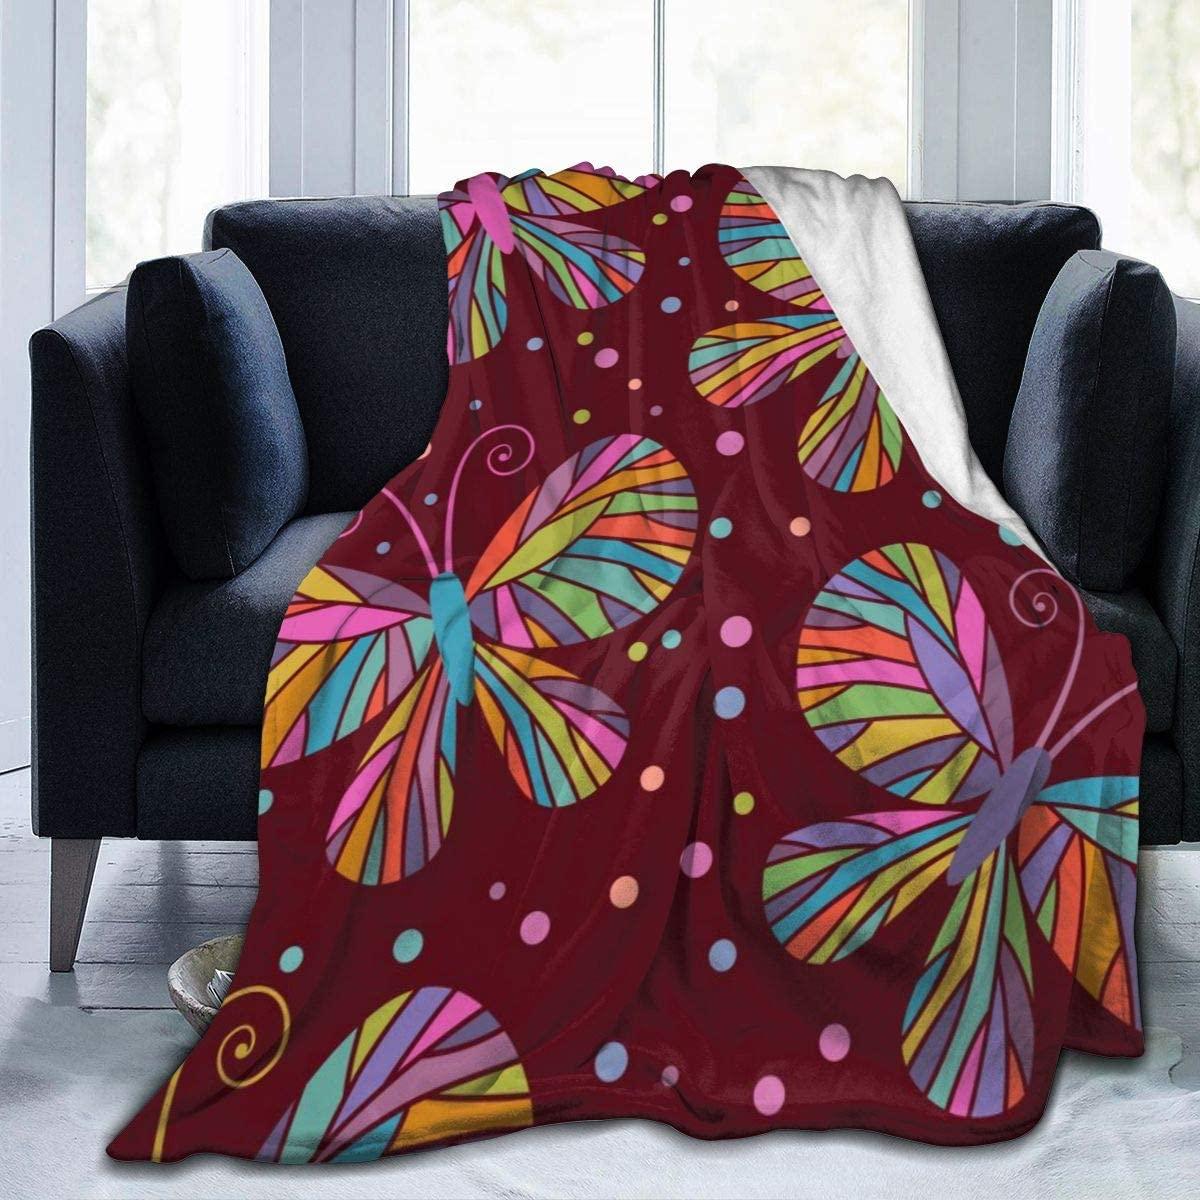 Micro Fleece Plush Soft Baby Blanket Burgundy Color Butterflies Fluffy Warm Toddler Bed/Crib Blanket Lightweight Flannel Daycare Nap Kids Sleeping Tummy Time Throw Blanket Girls Boy Clearance Kid/Baby